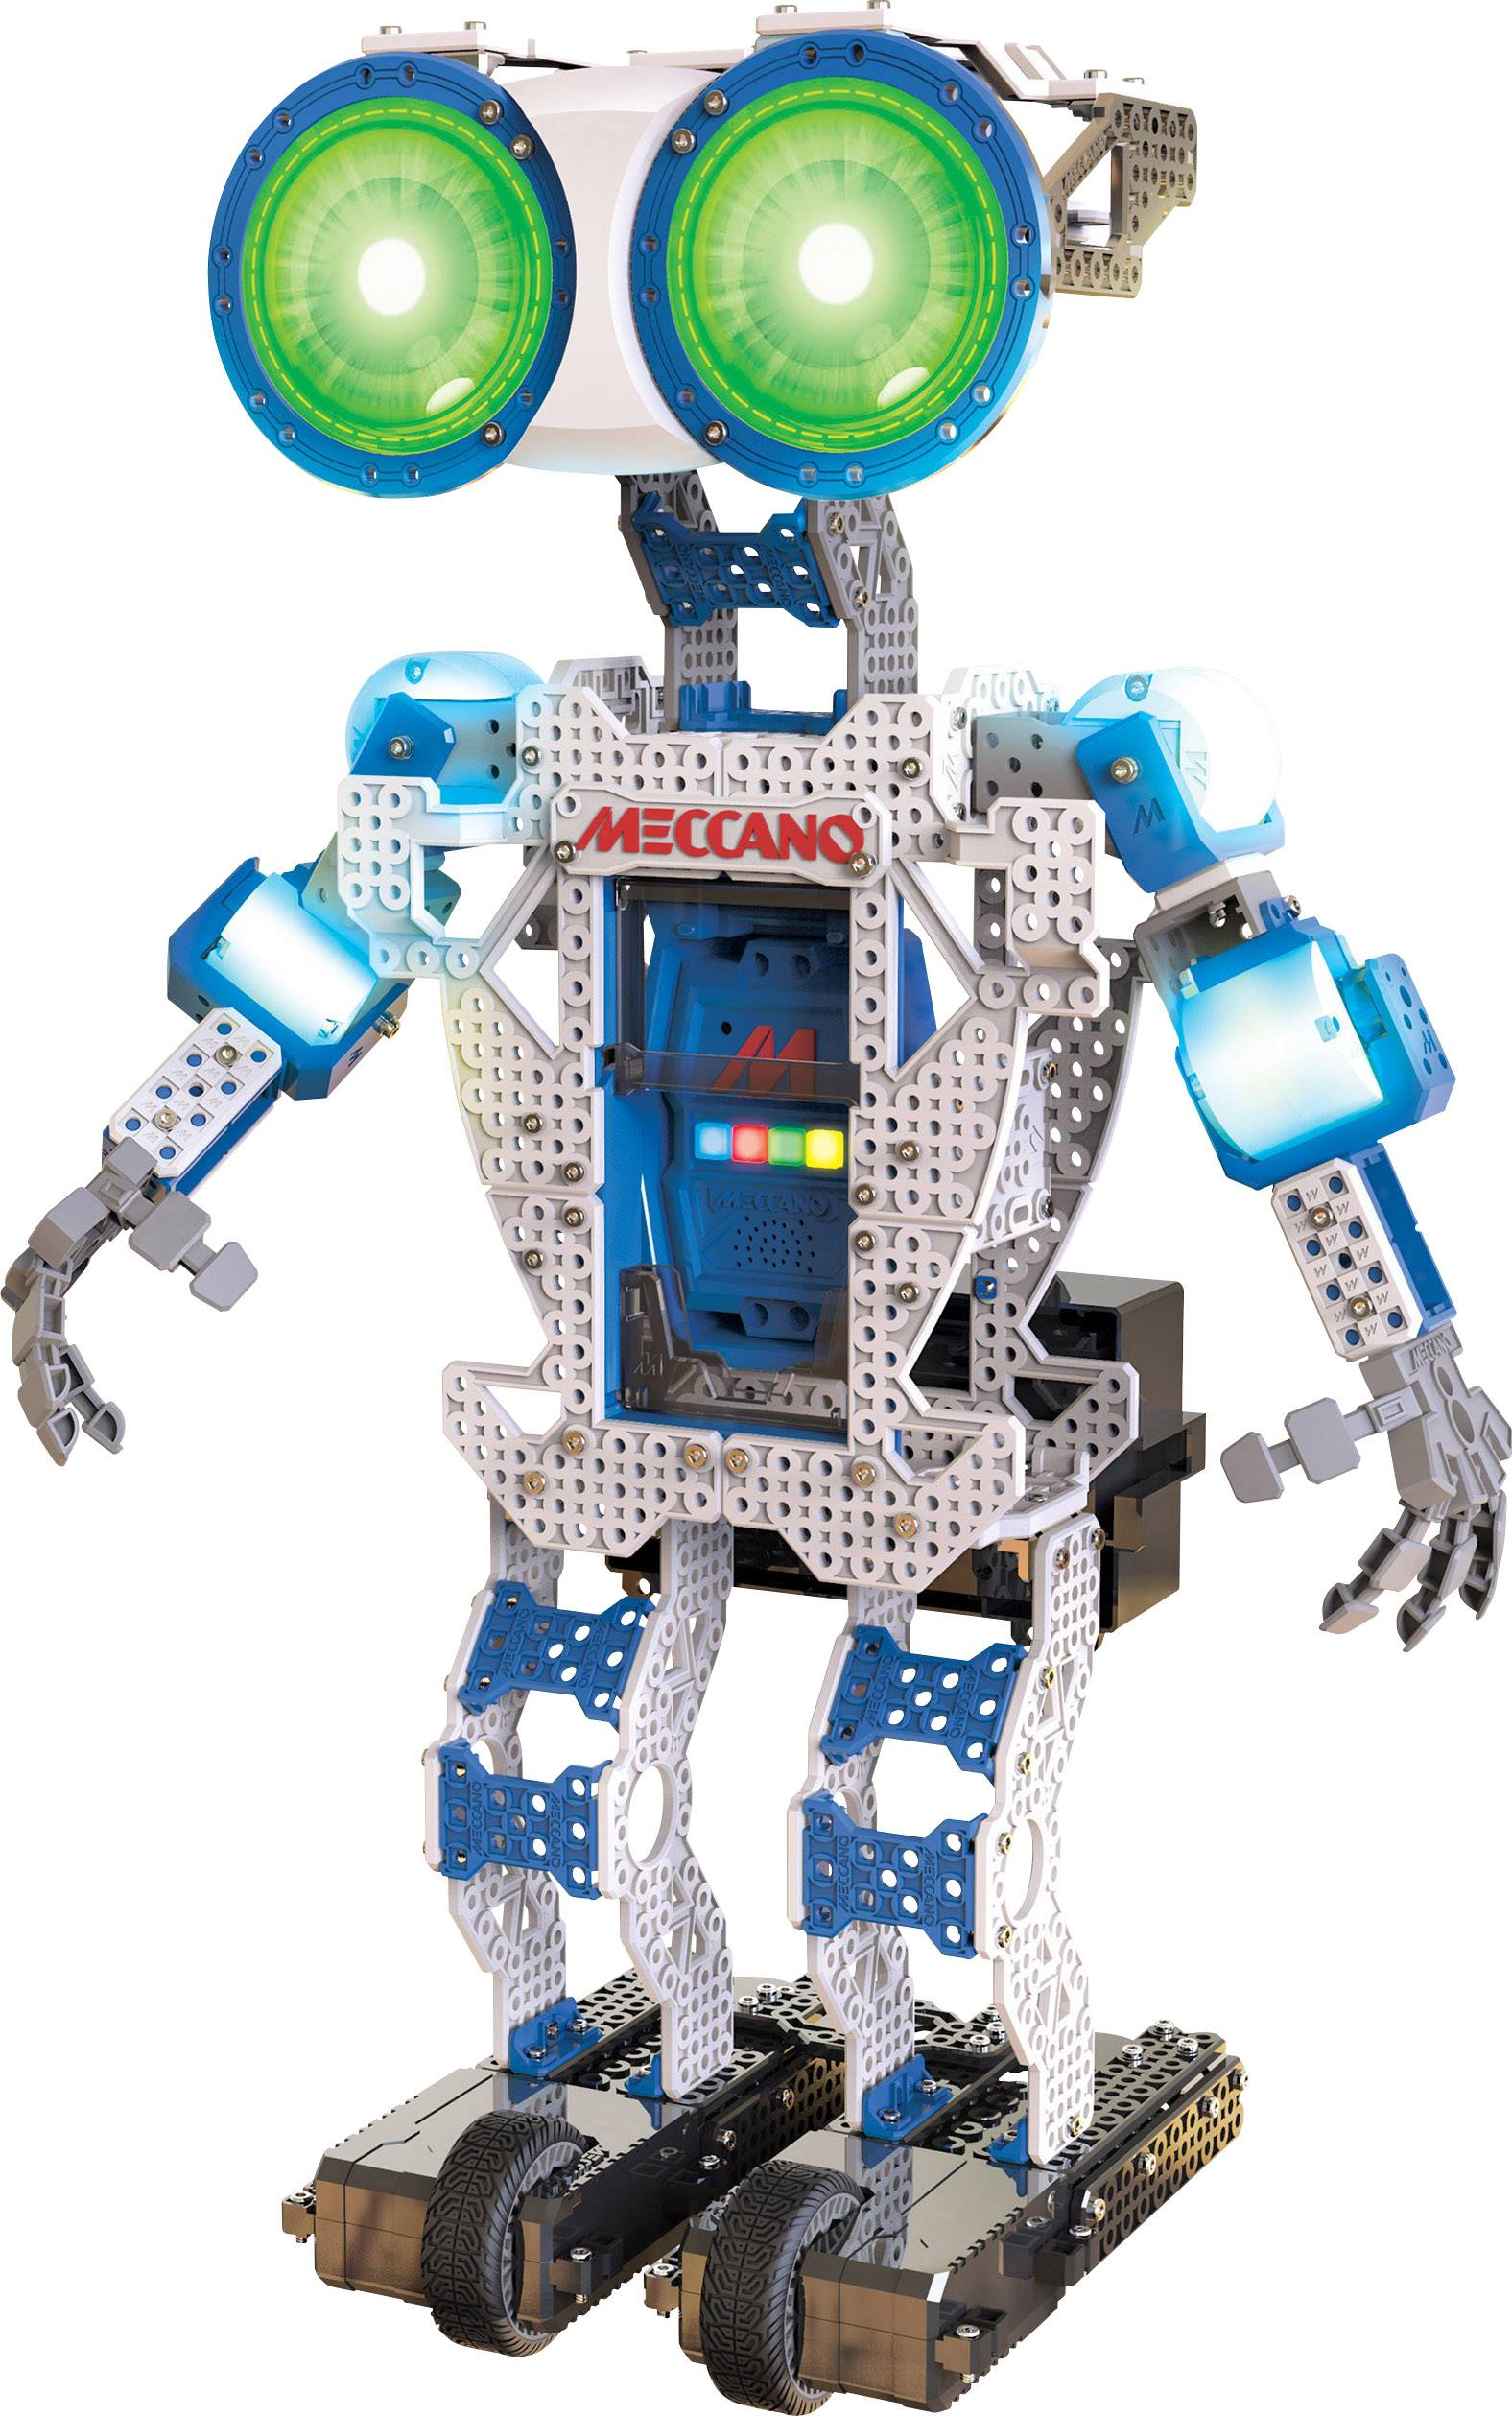 Hračka robota Meccano Tech Meccanoid 2.0 (GS16)